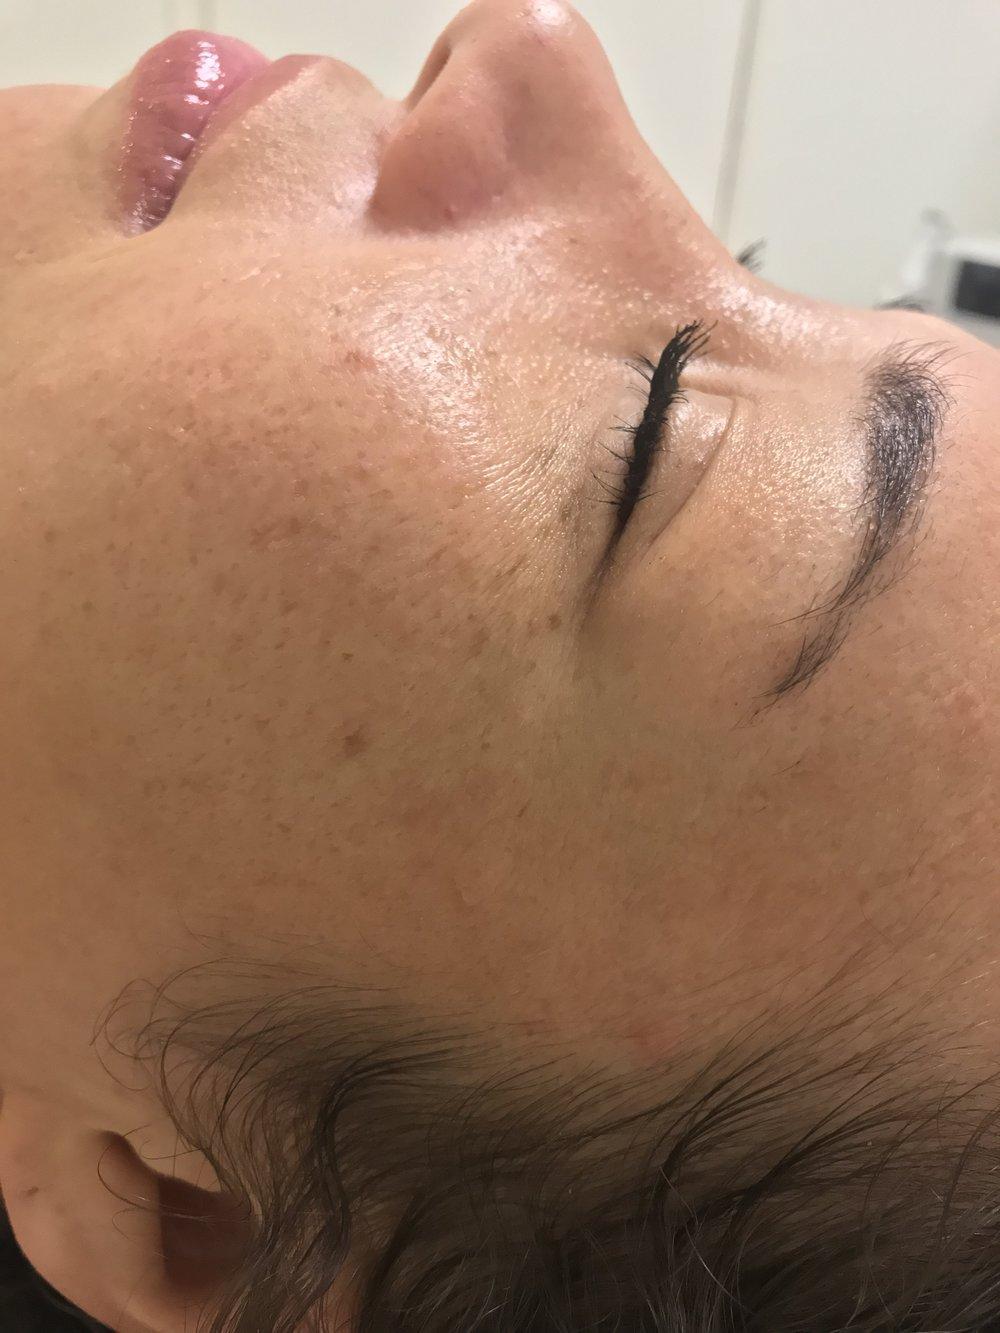 before Qi beauty facial treatment